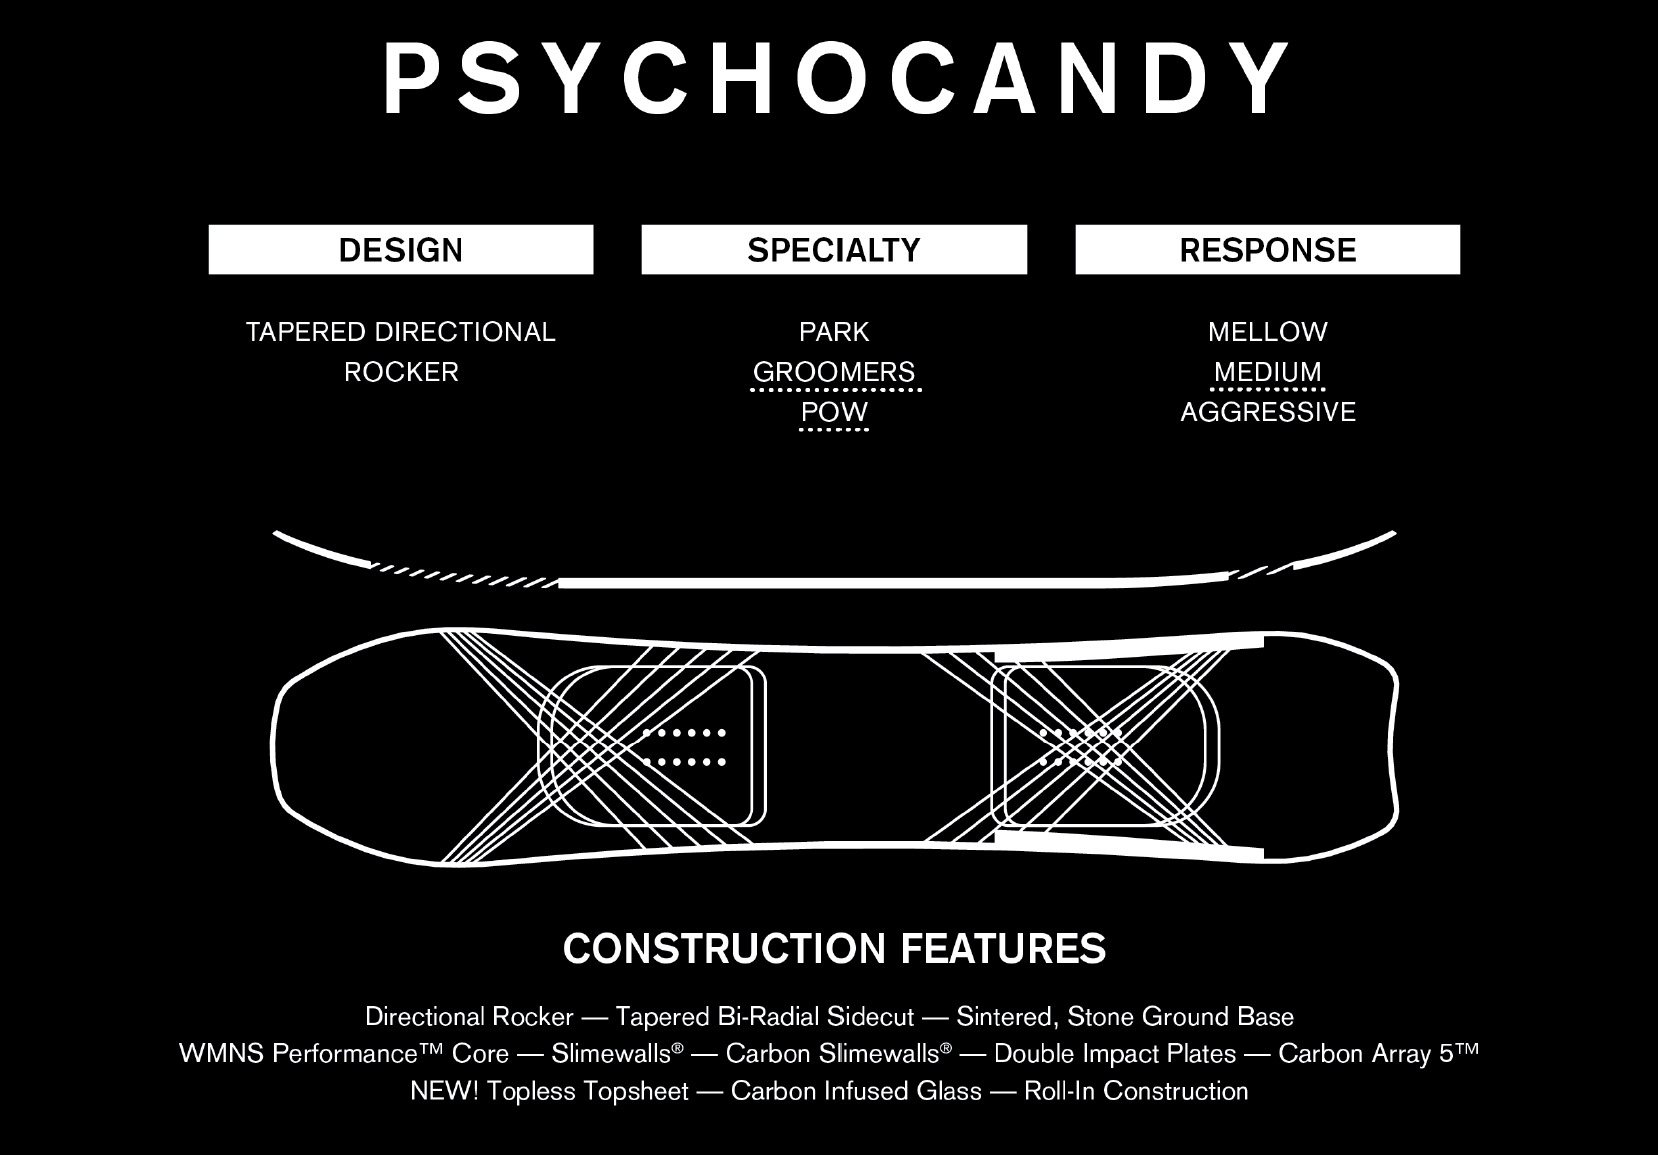 PSYCHOCANDY-2022-Ride-Snowboards-All-Mountain-Snowboard